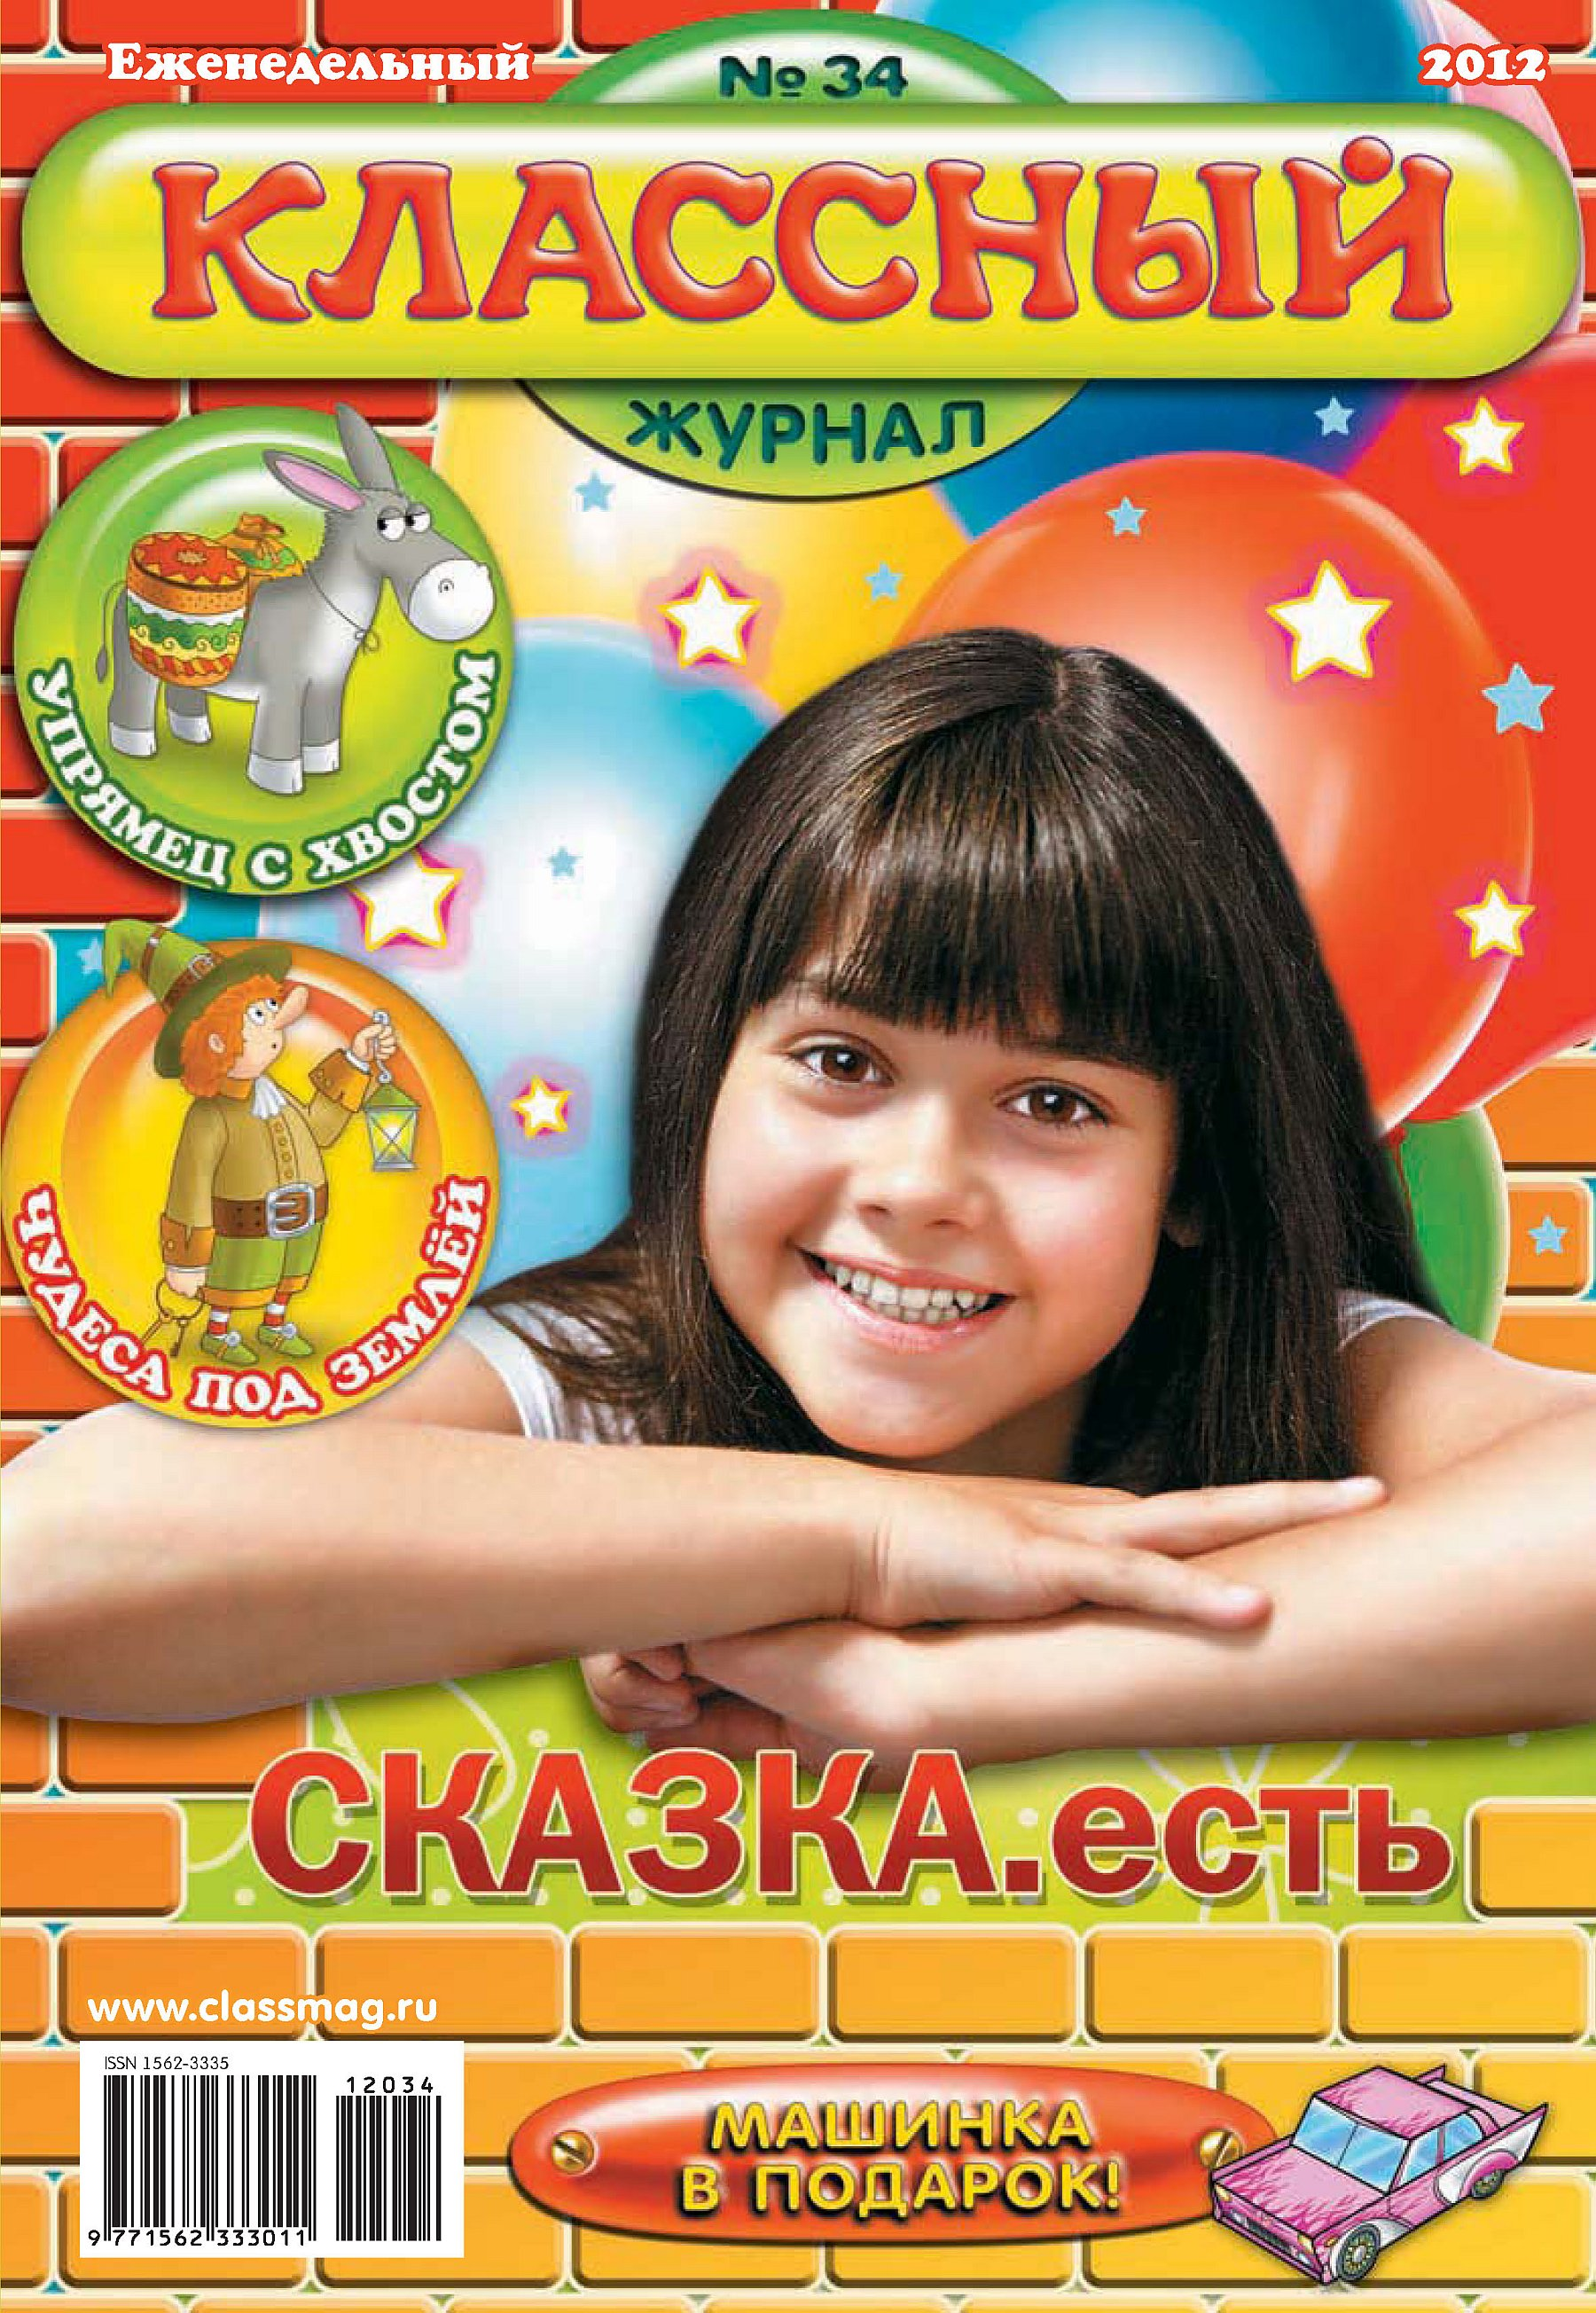 Классный журнал №34/2012